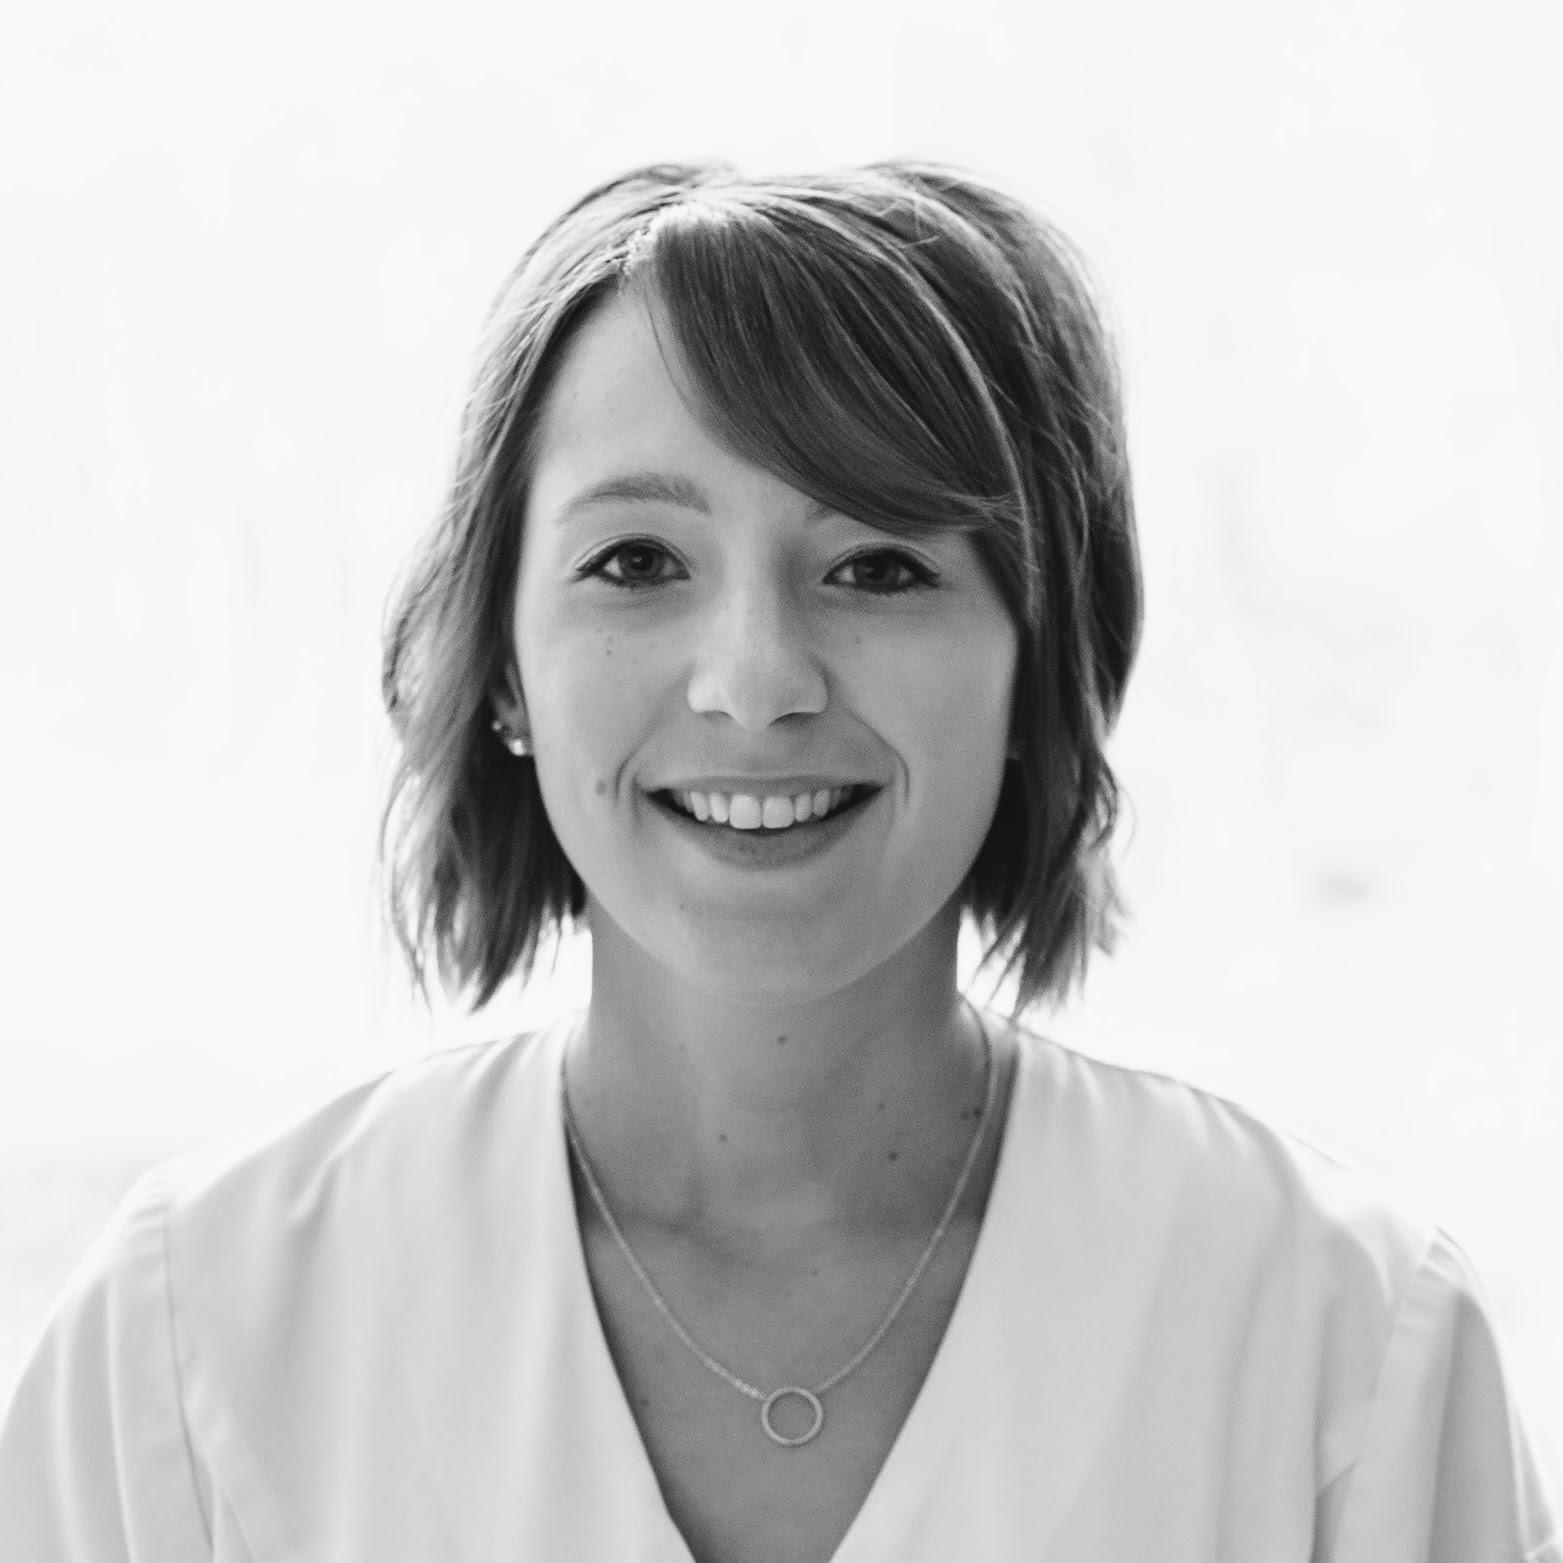 Mathilde Lembeye